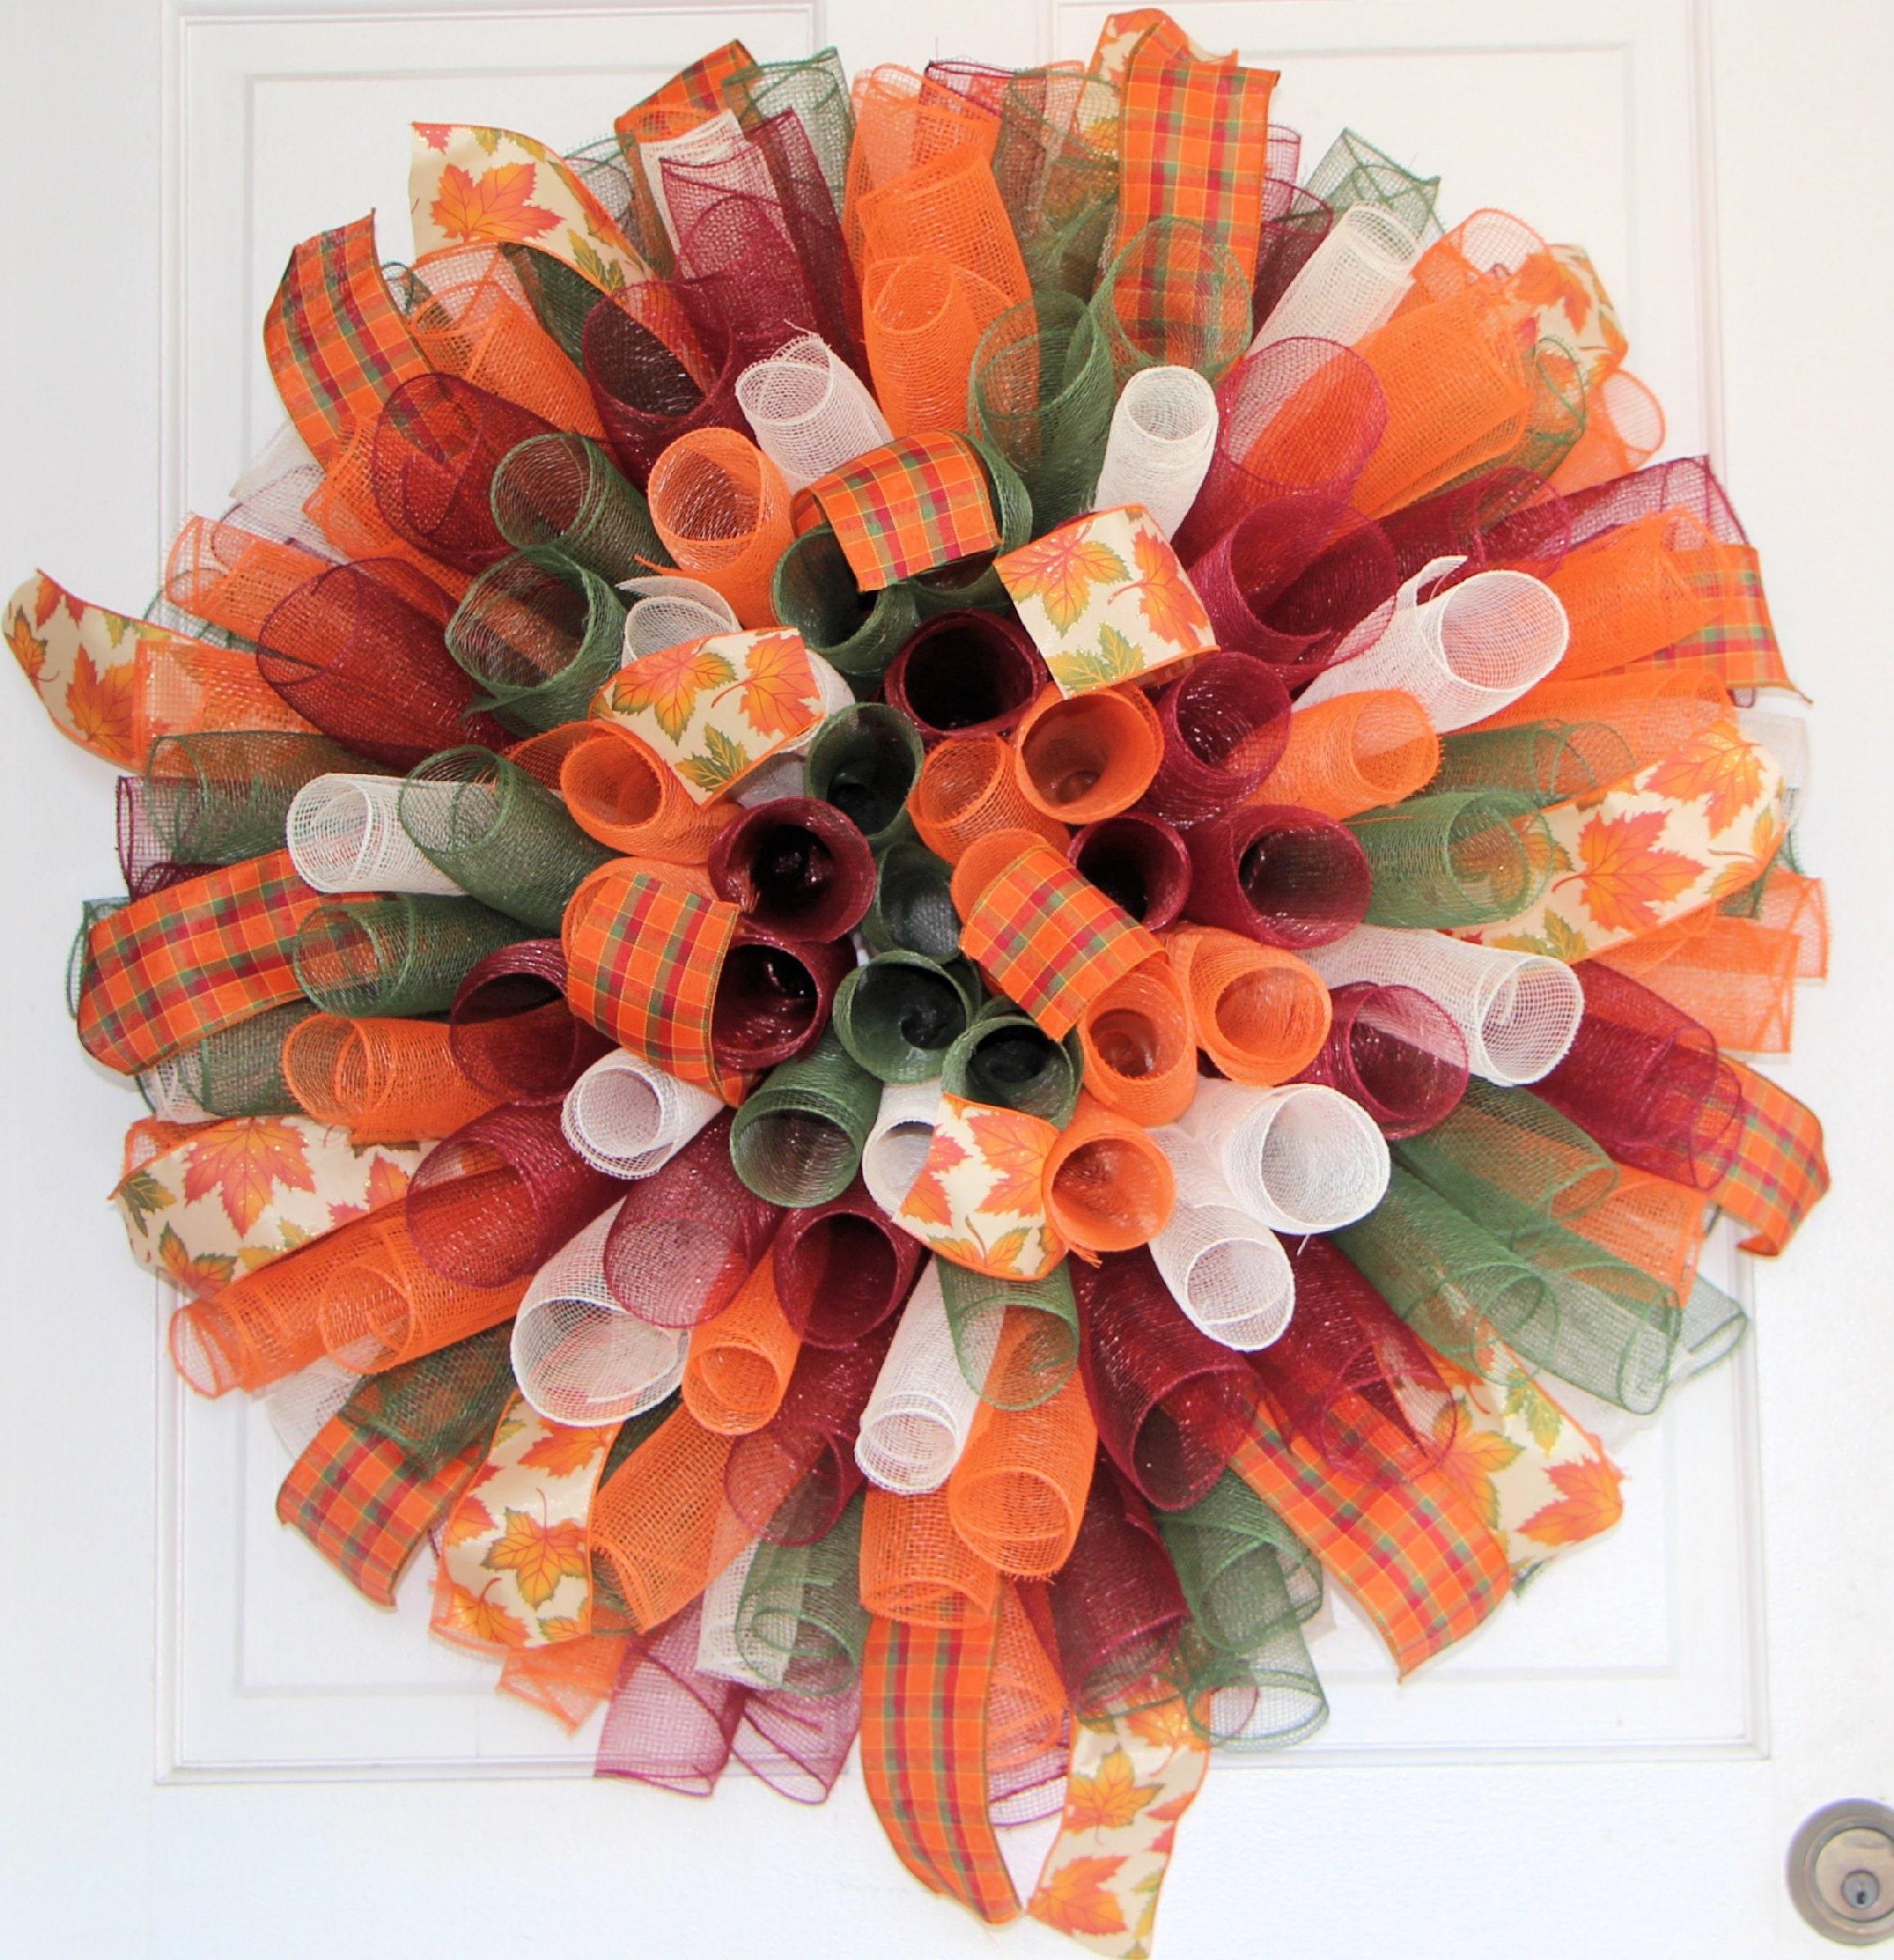 XL FALL CURLY MESH WREATH Orange Brown Gold Spiral Harvest Thanksgiving Decor